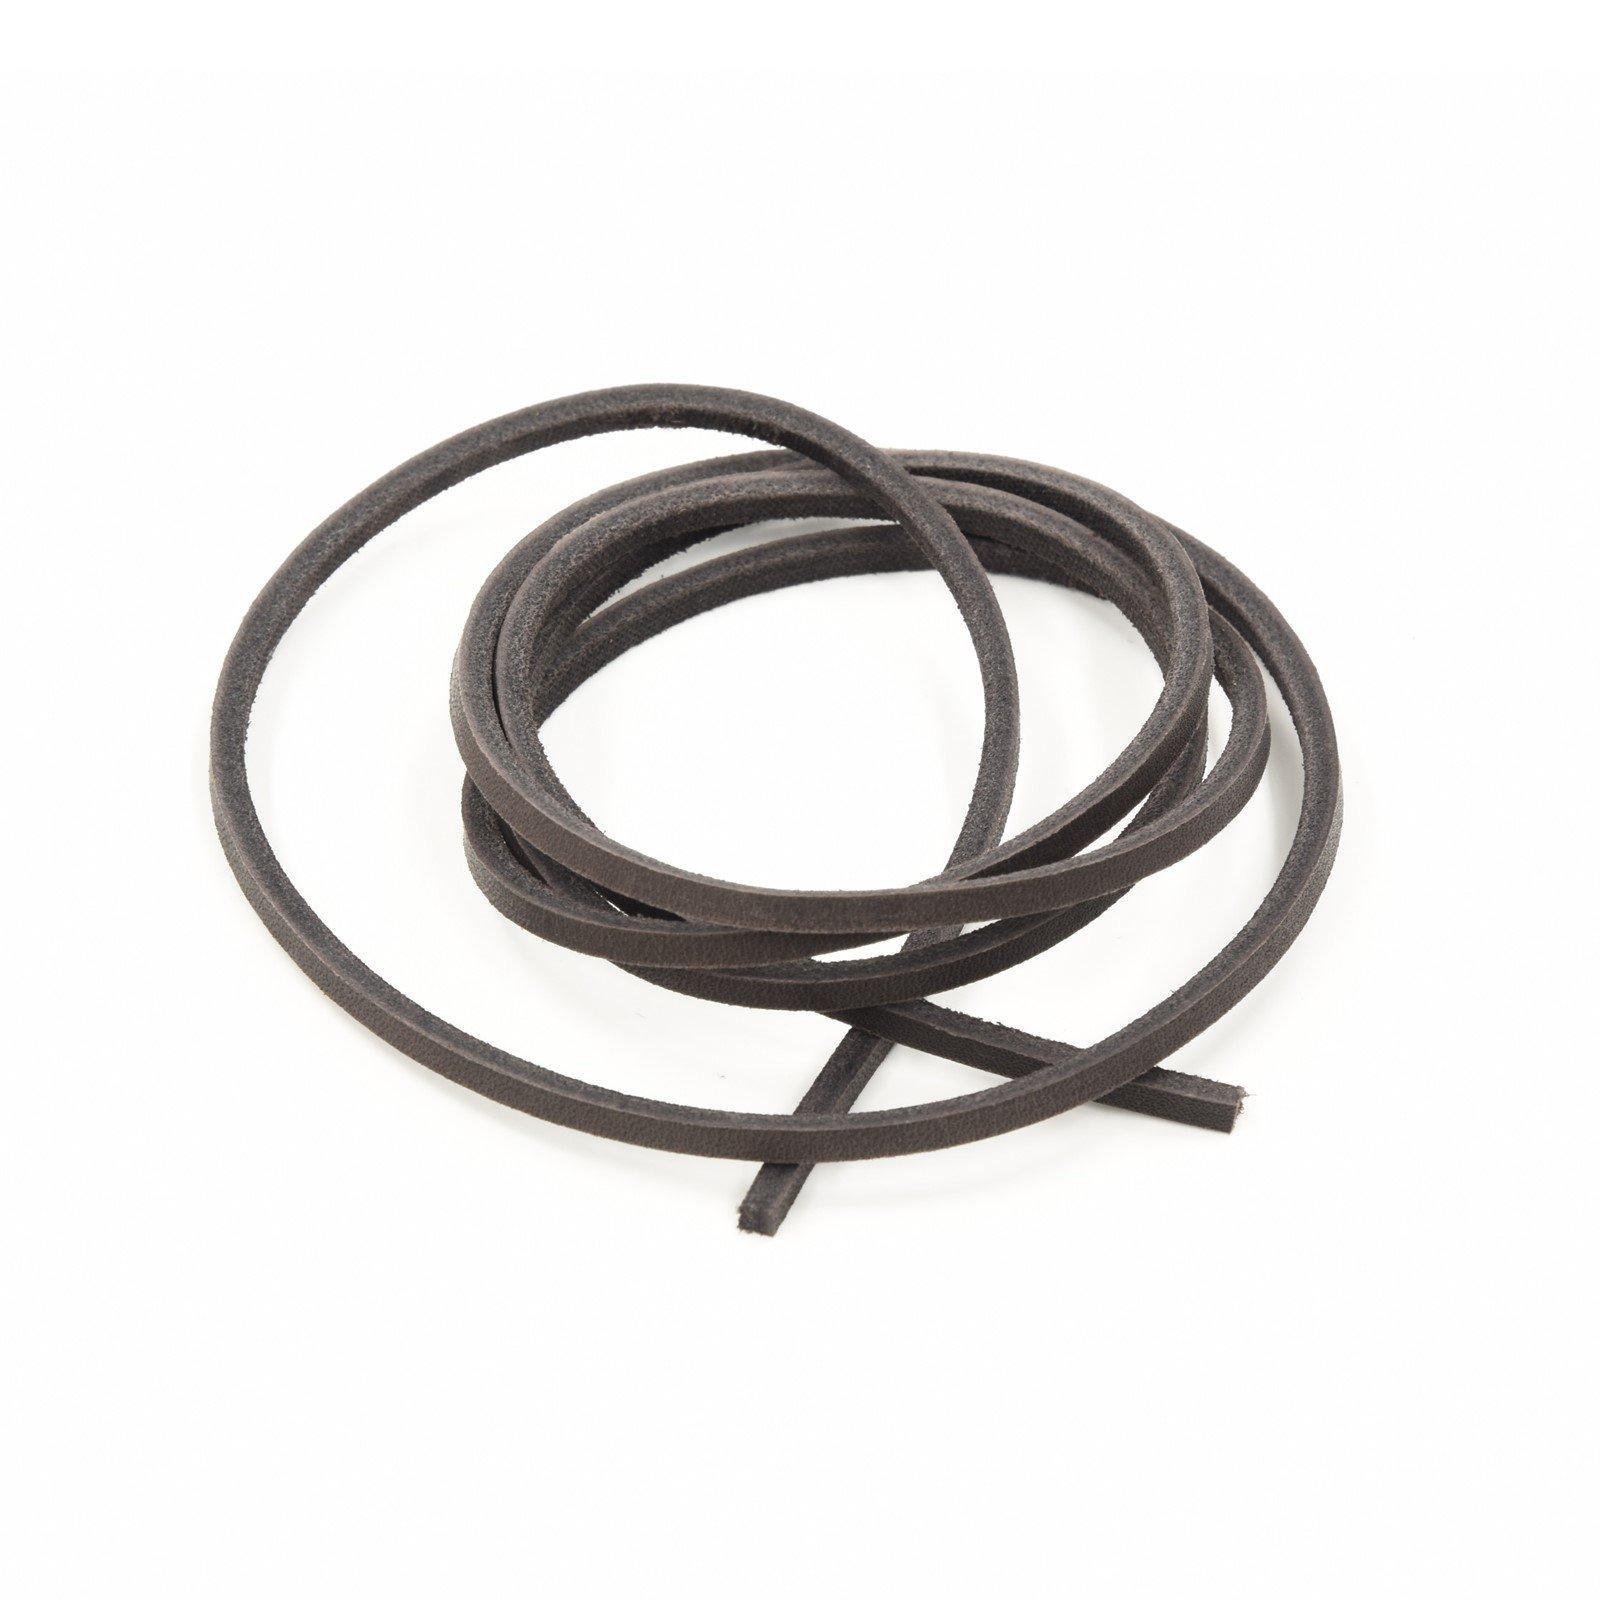 "Deerskin Leather Lacing Cord Jewelry Necklace 1//8/"" x 36/"" /& 1//4/"" x 72 bundles DIY"